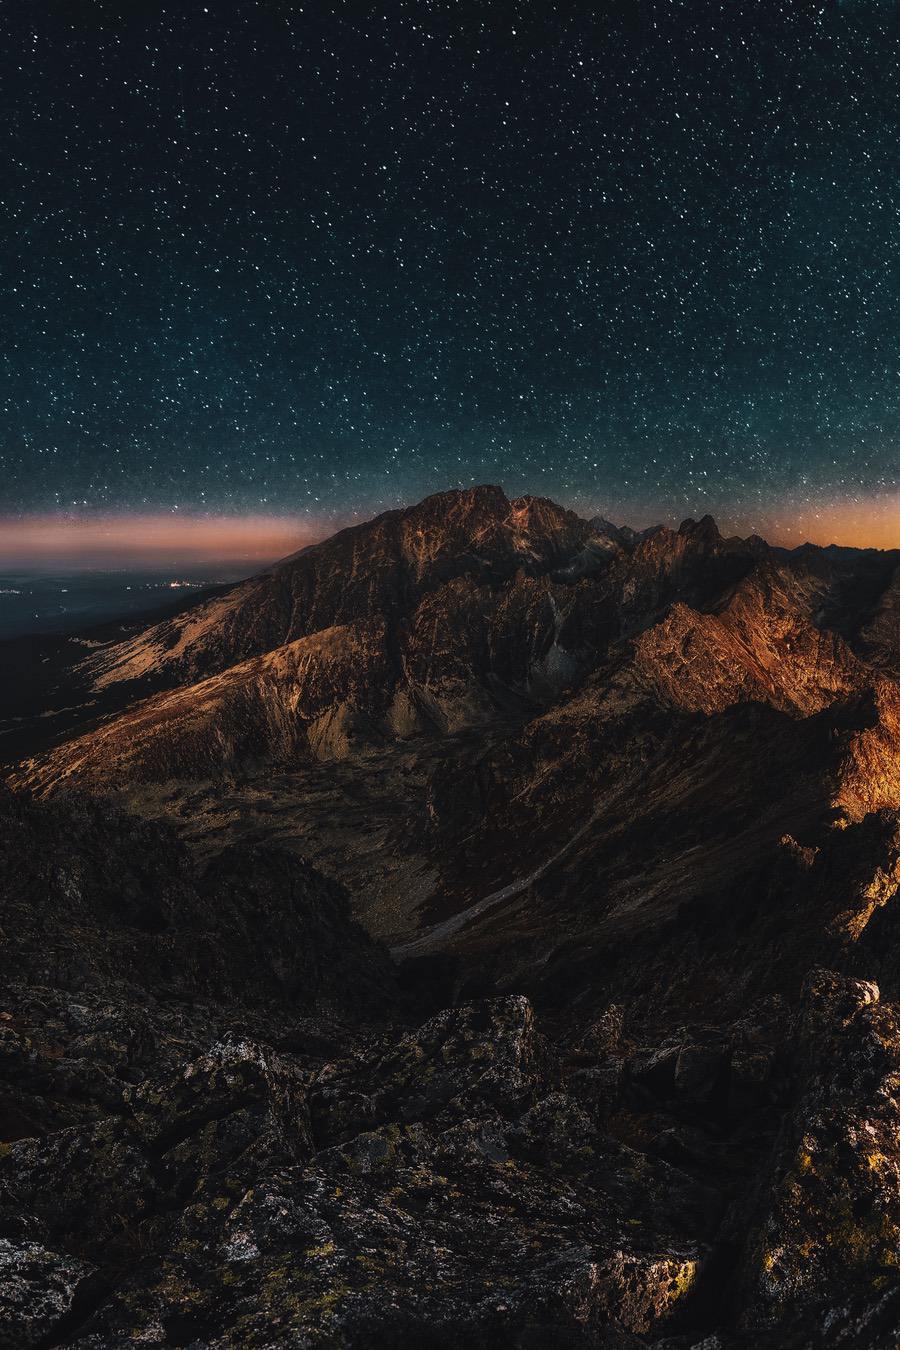 Mountain iPhone wallpaper